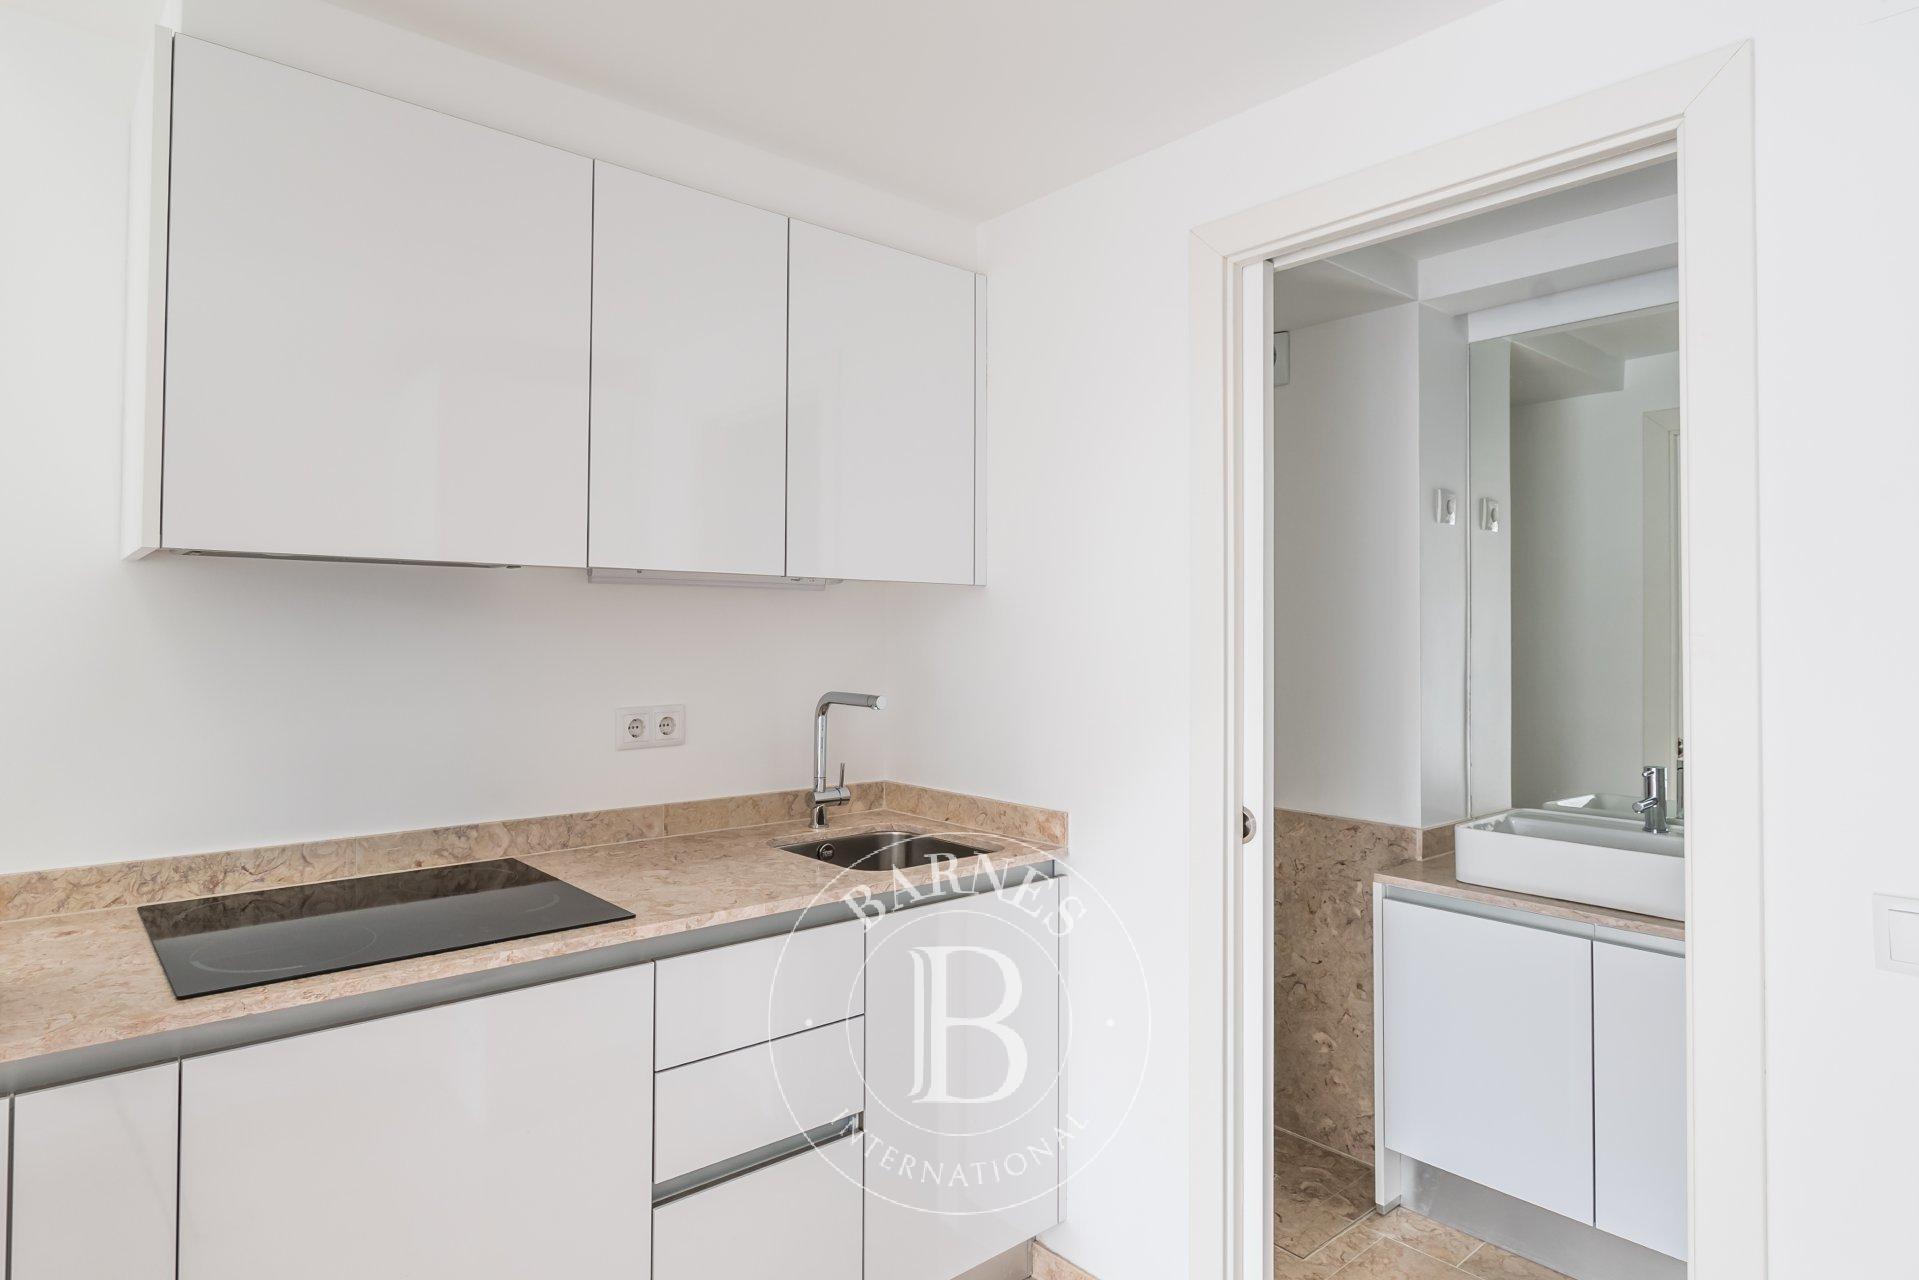 Apartamento T1 Duplex em Santa Catarina